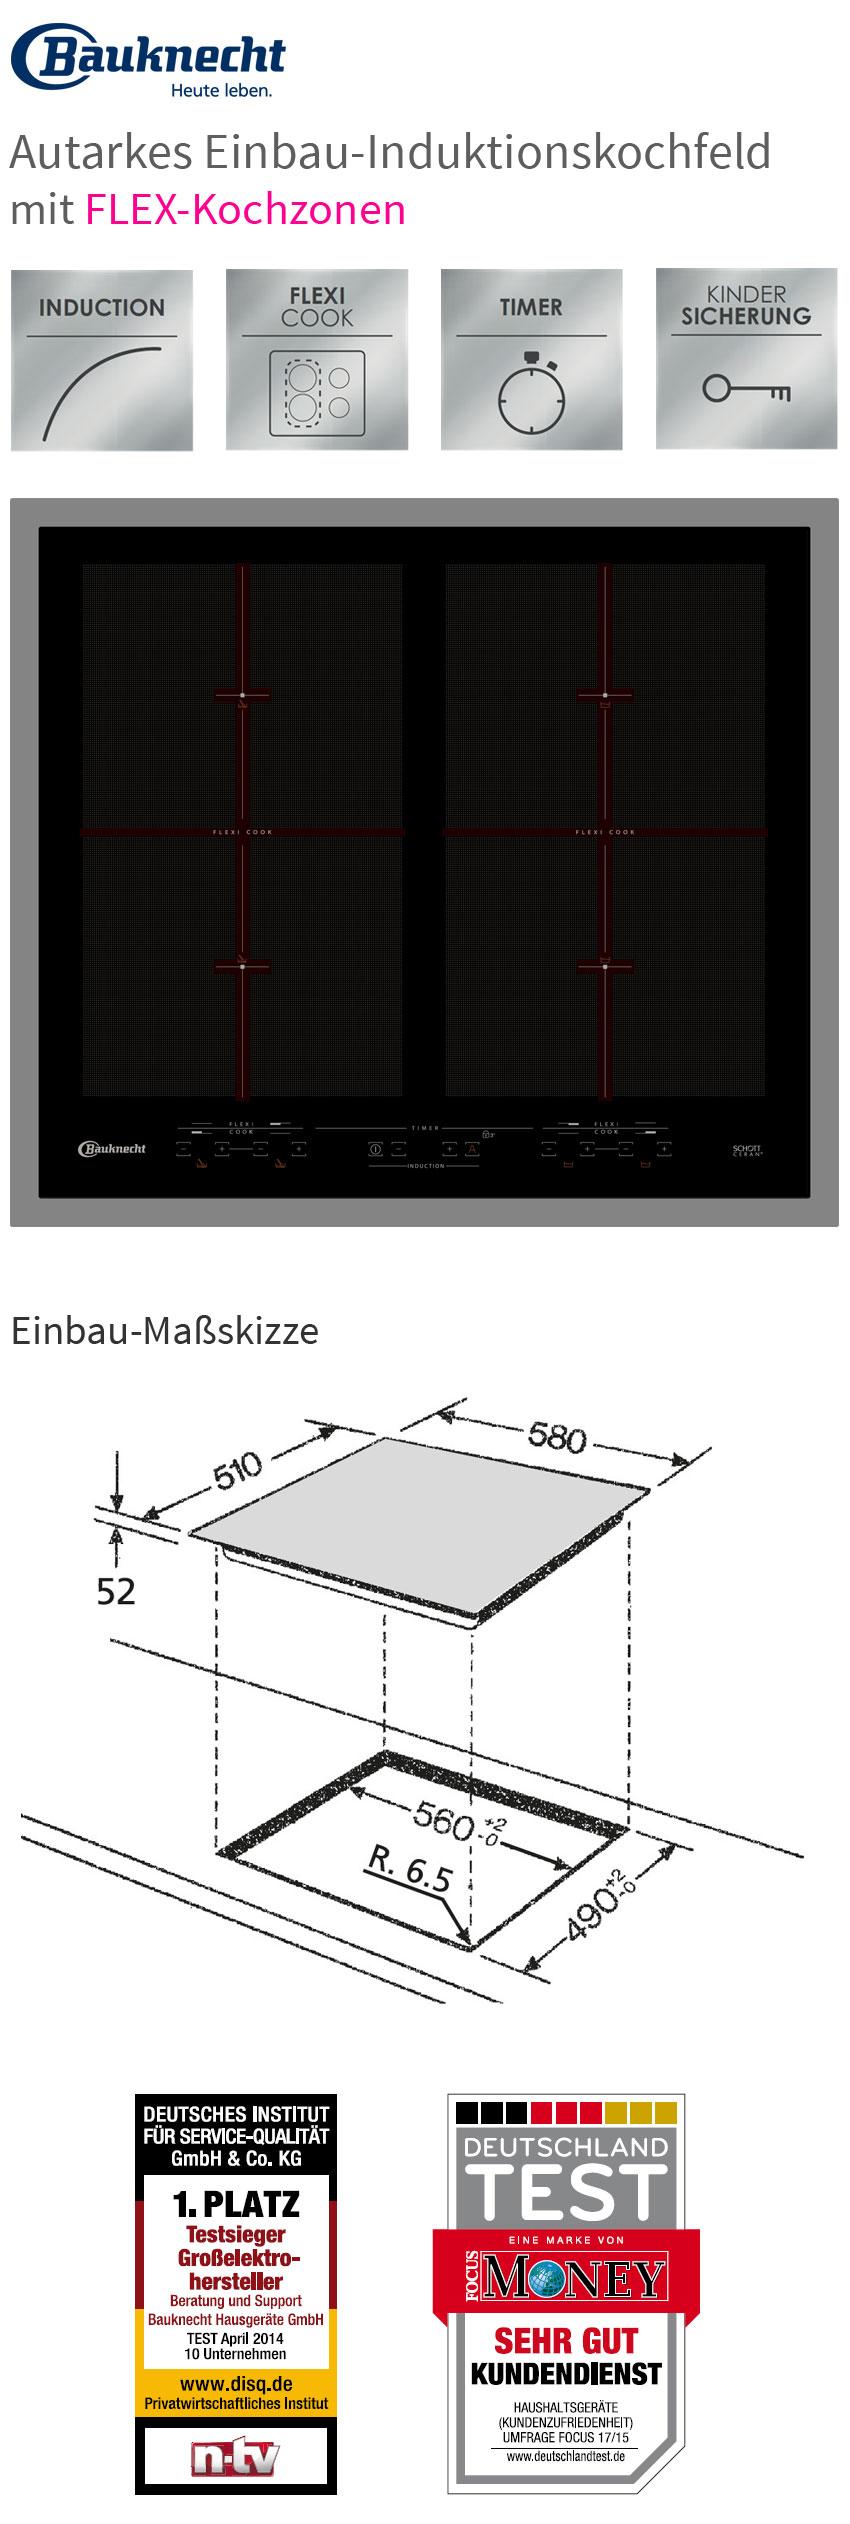 bauknecht esiff7640in flex induktionskochfeld edelstahlrahmen einbau kochfeld ebay. Black Bedroom Furniture Sets. Home Design Ideas